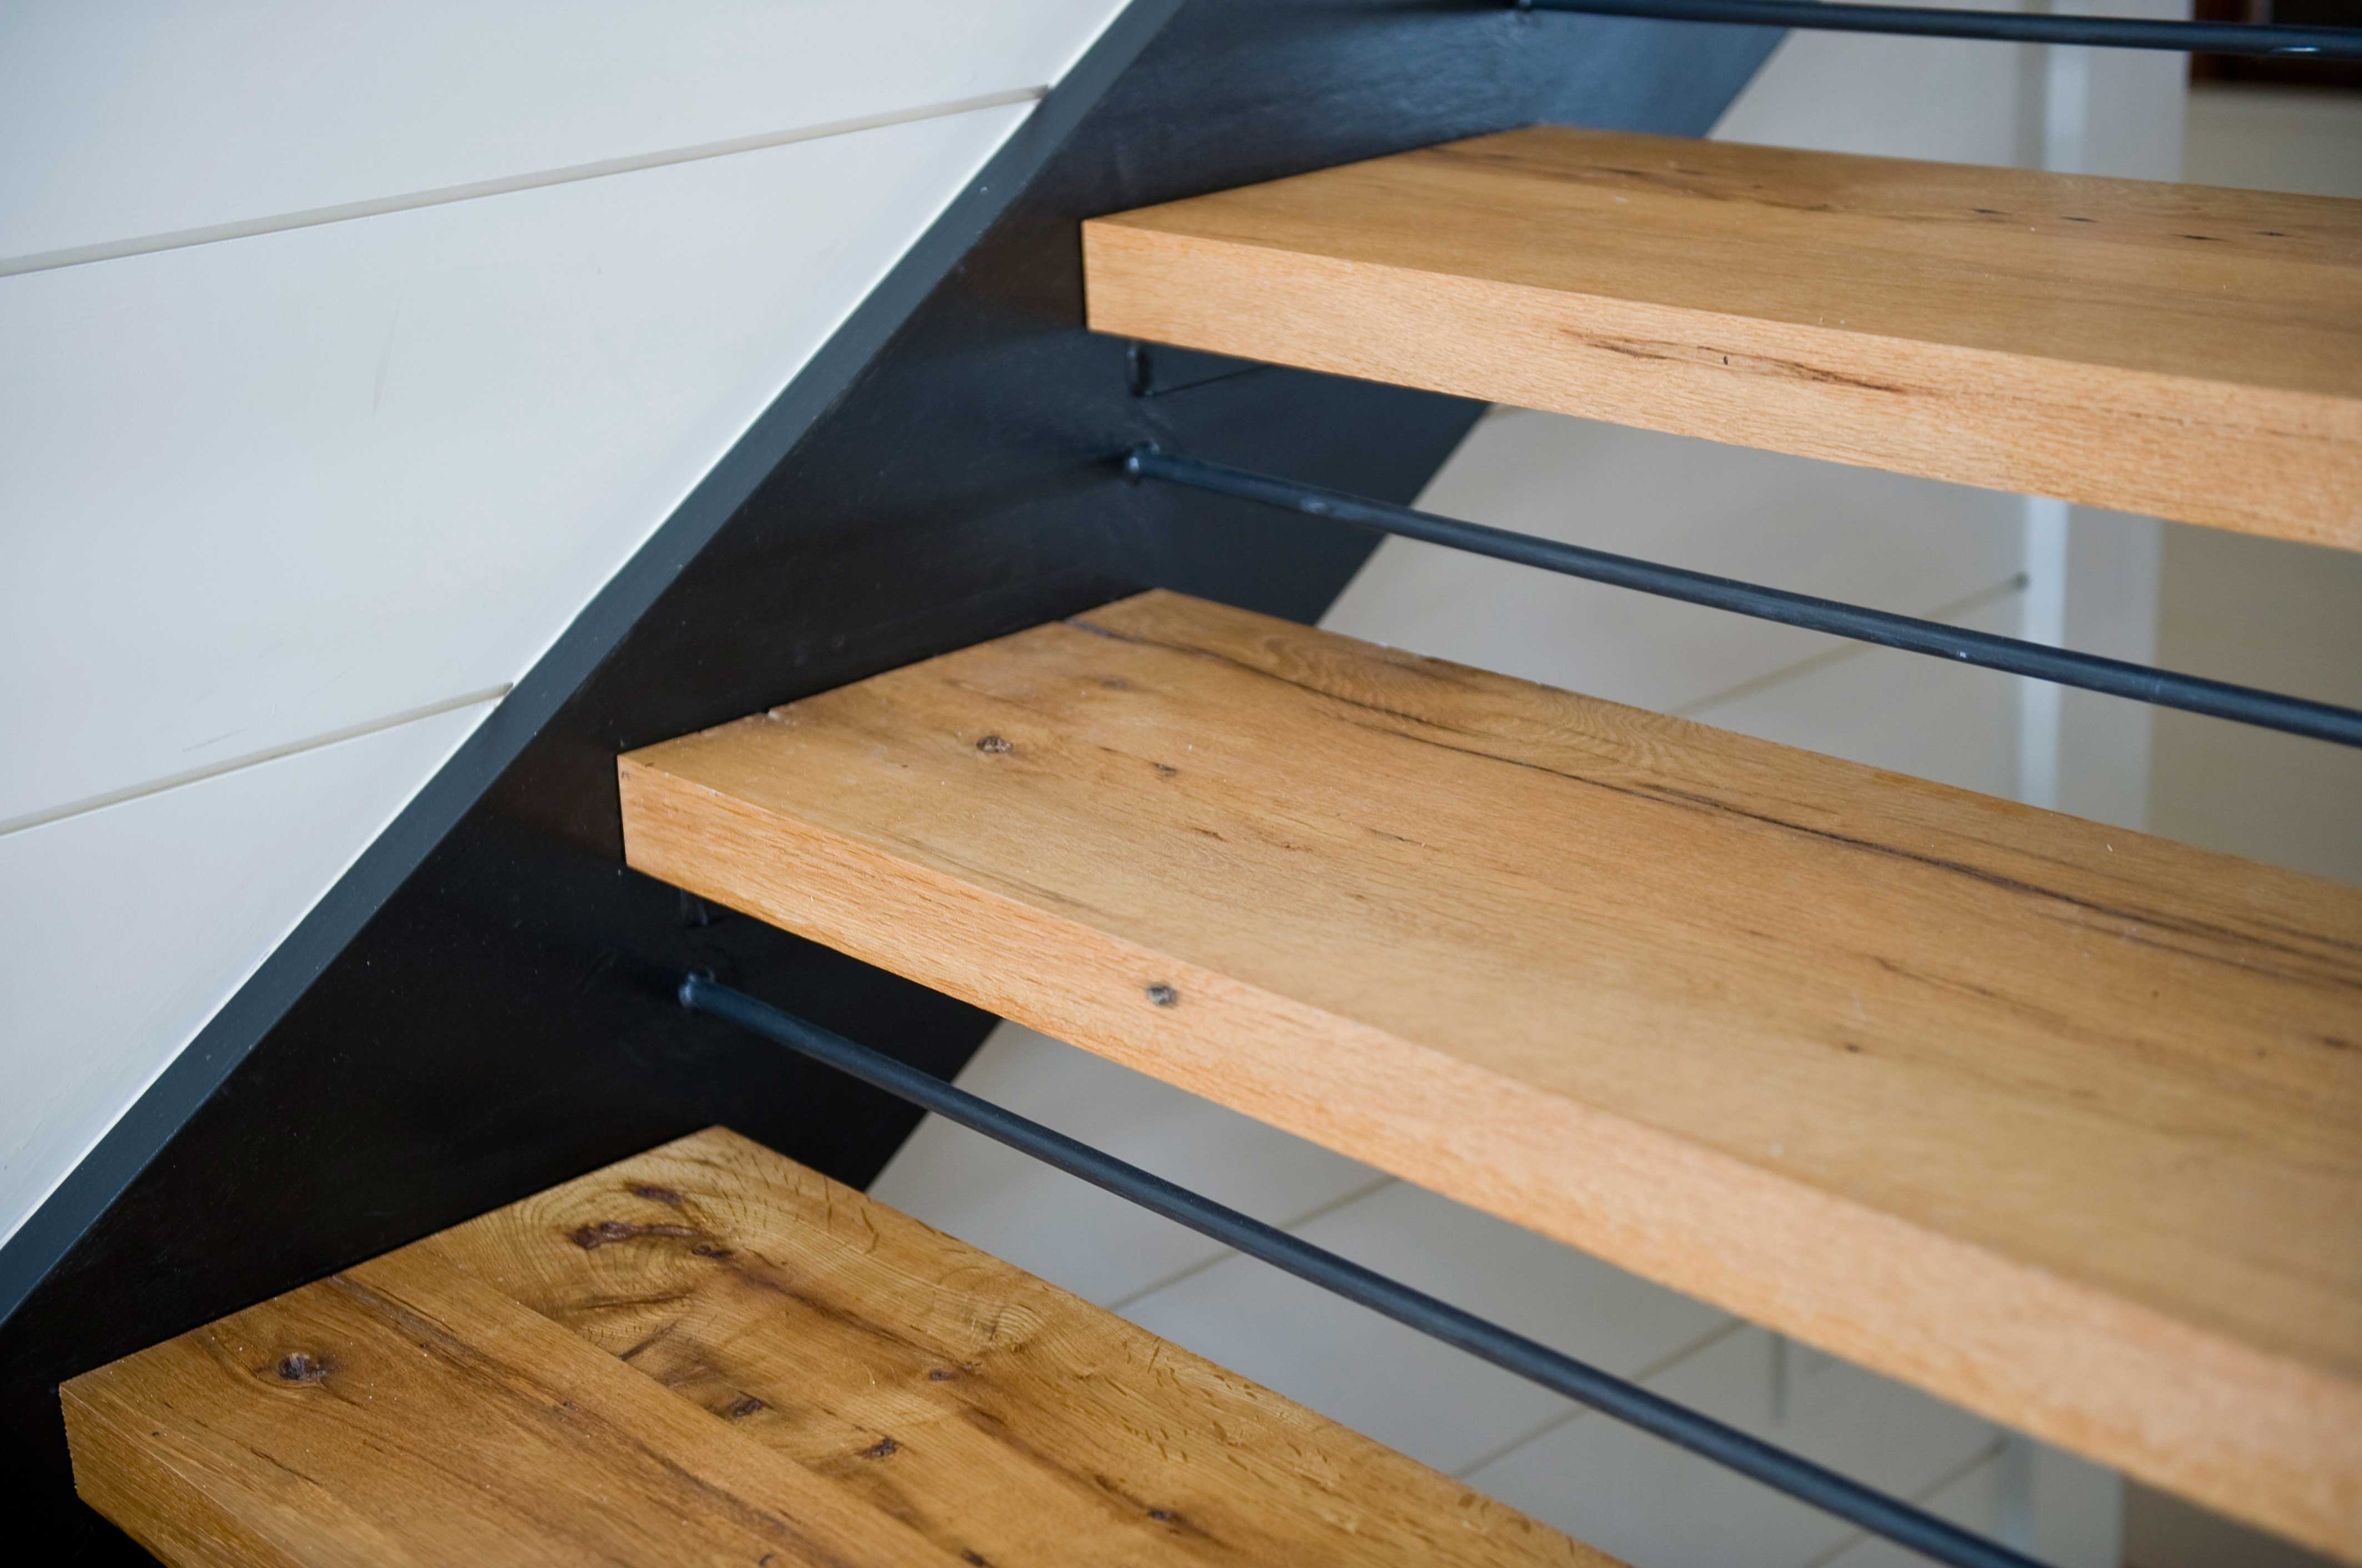 Longleaf Lumber Custom Reclaimed Wood Stair Treads Mouldings With Stair Protectors Wooden Stairs (View 12 of 15)